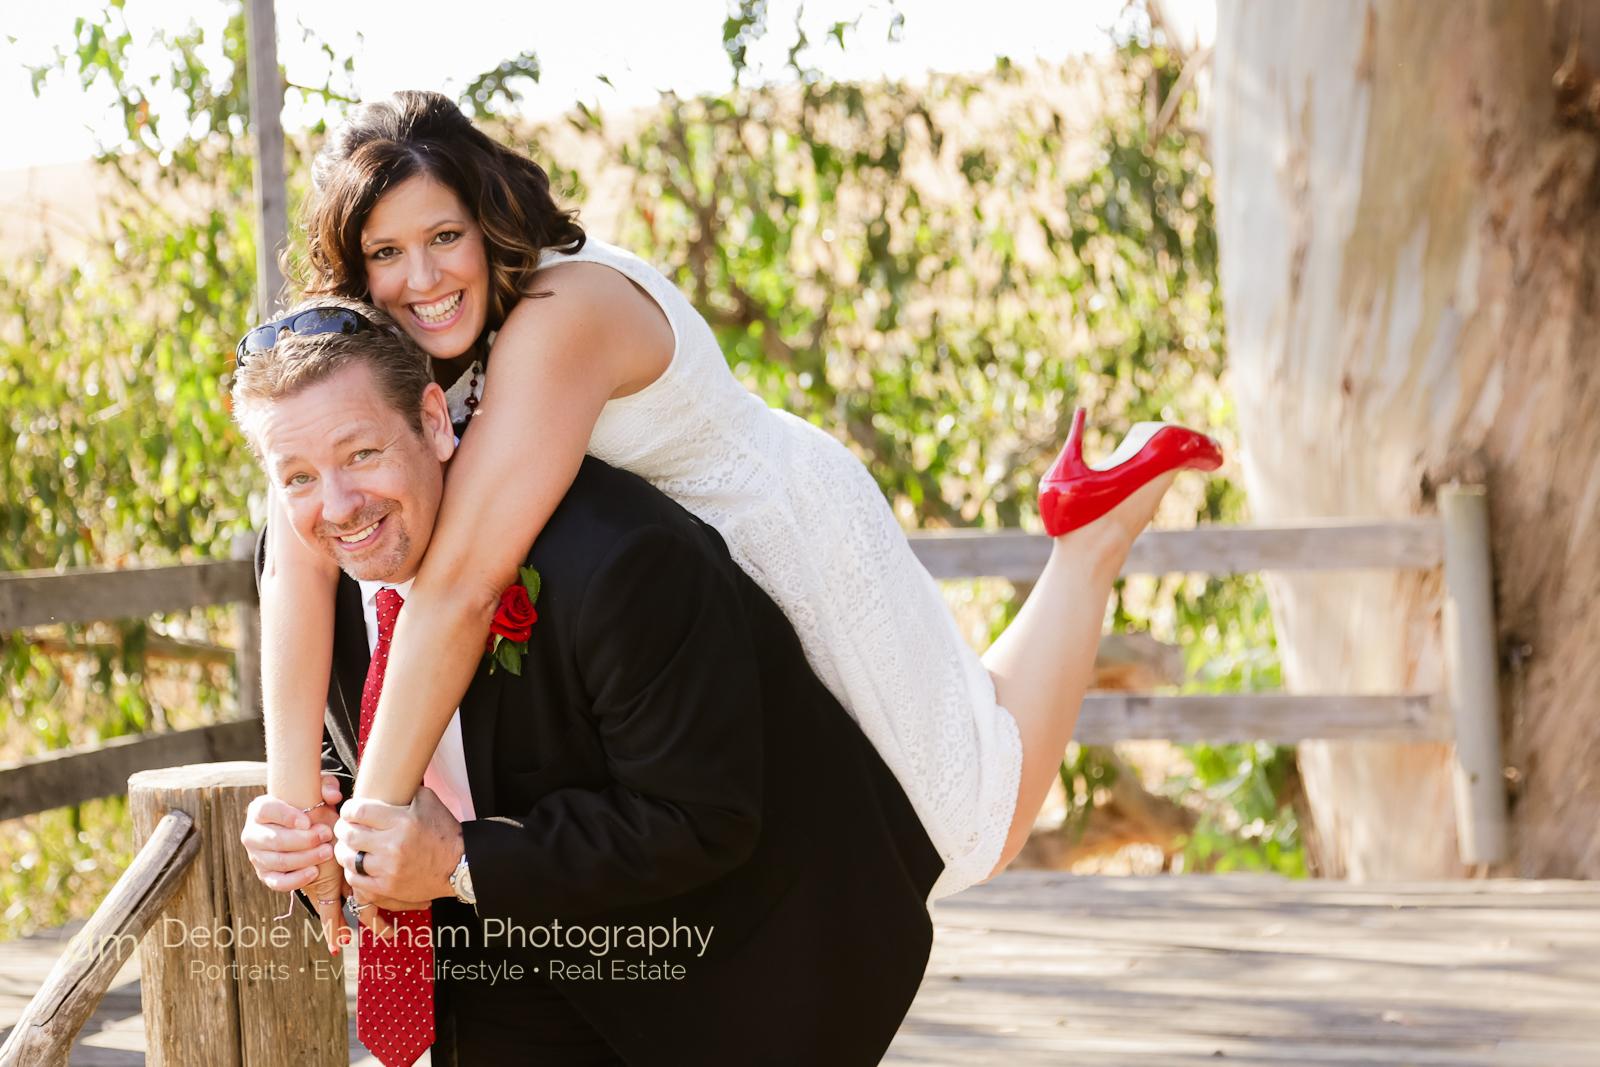 Debbie-Markham-Photography_Small-Town-Wedding_Destination-Wedding_California_Central-Coast-2022.jpg